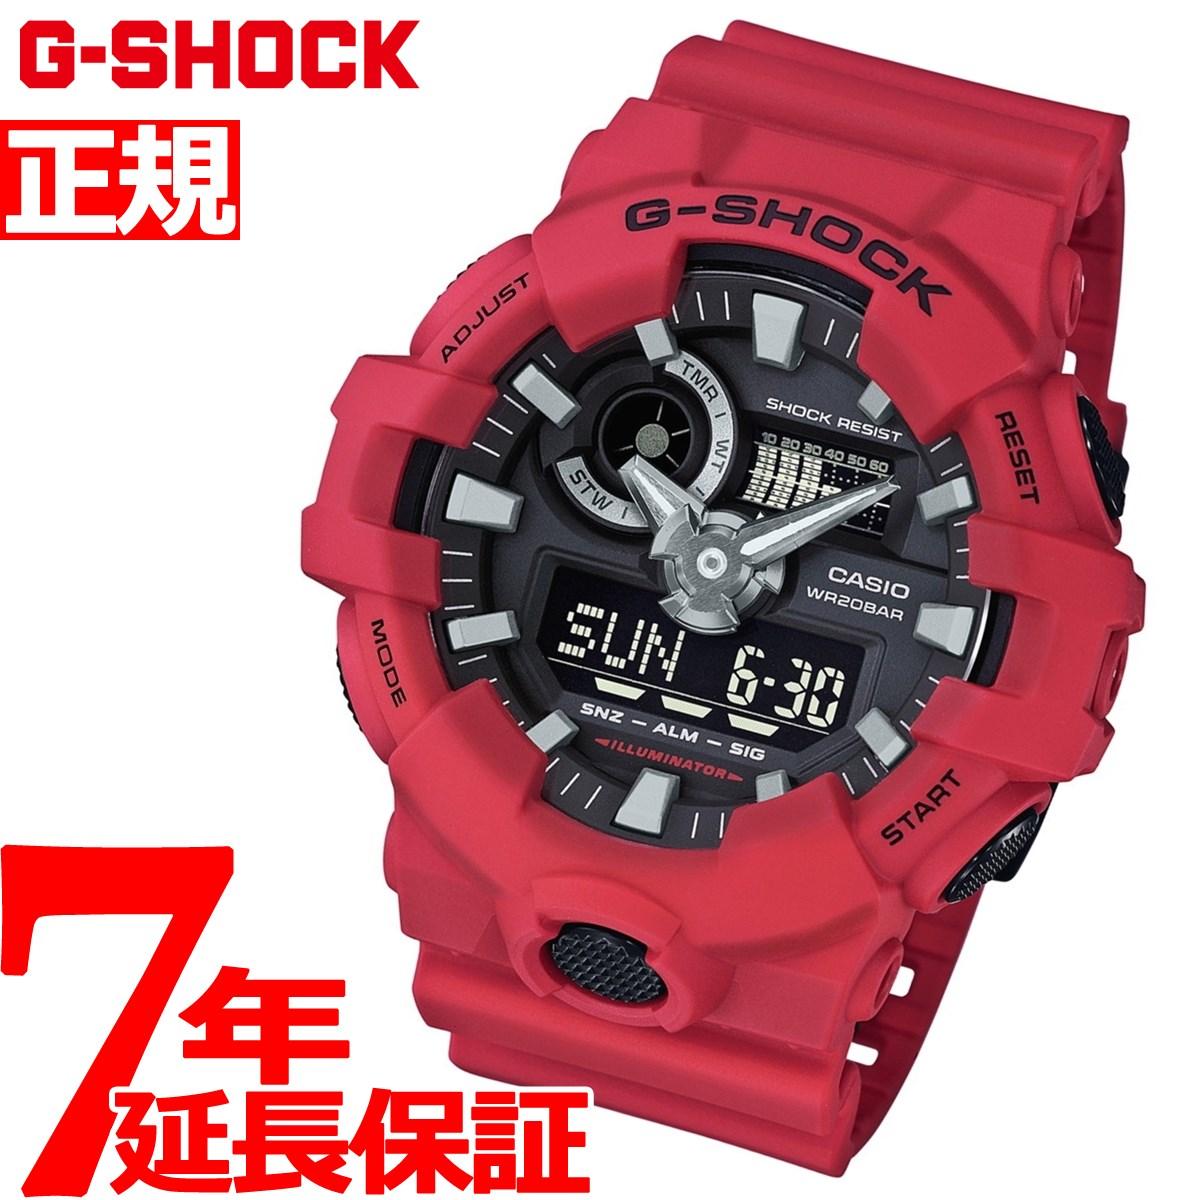 G-SHOCK 赤 レッド 腕時計 メンズ アナデジ GA-700-4AJF【正規品】